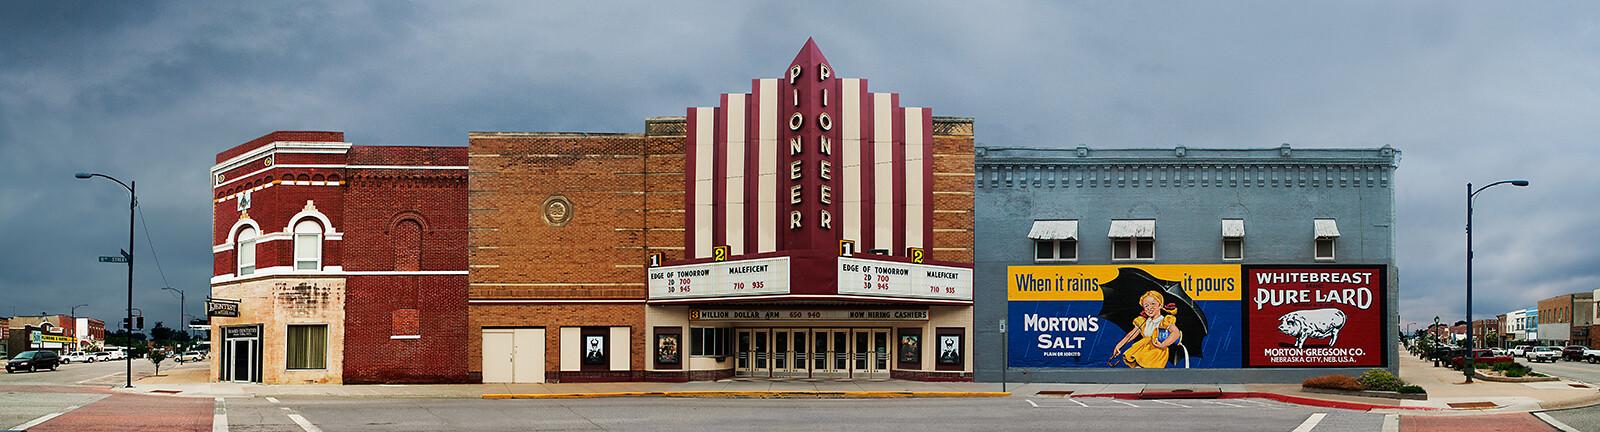 Nebraska City, Nebraska, 11th Street - Larry Yust